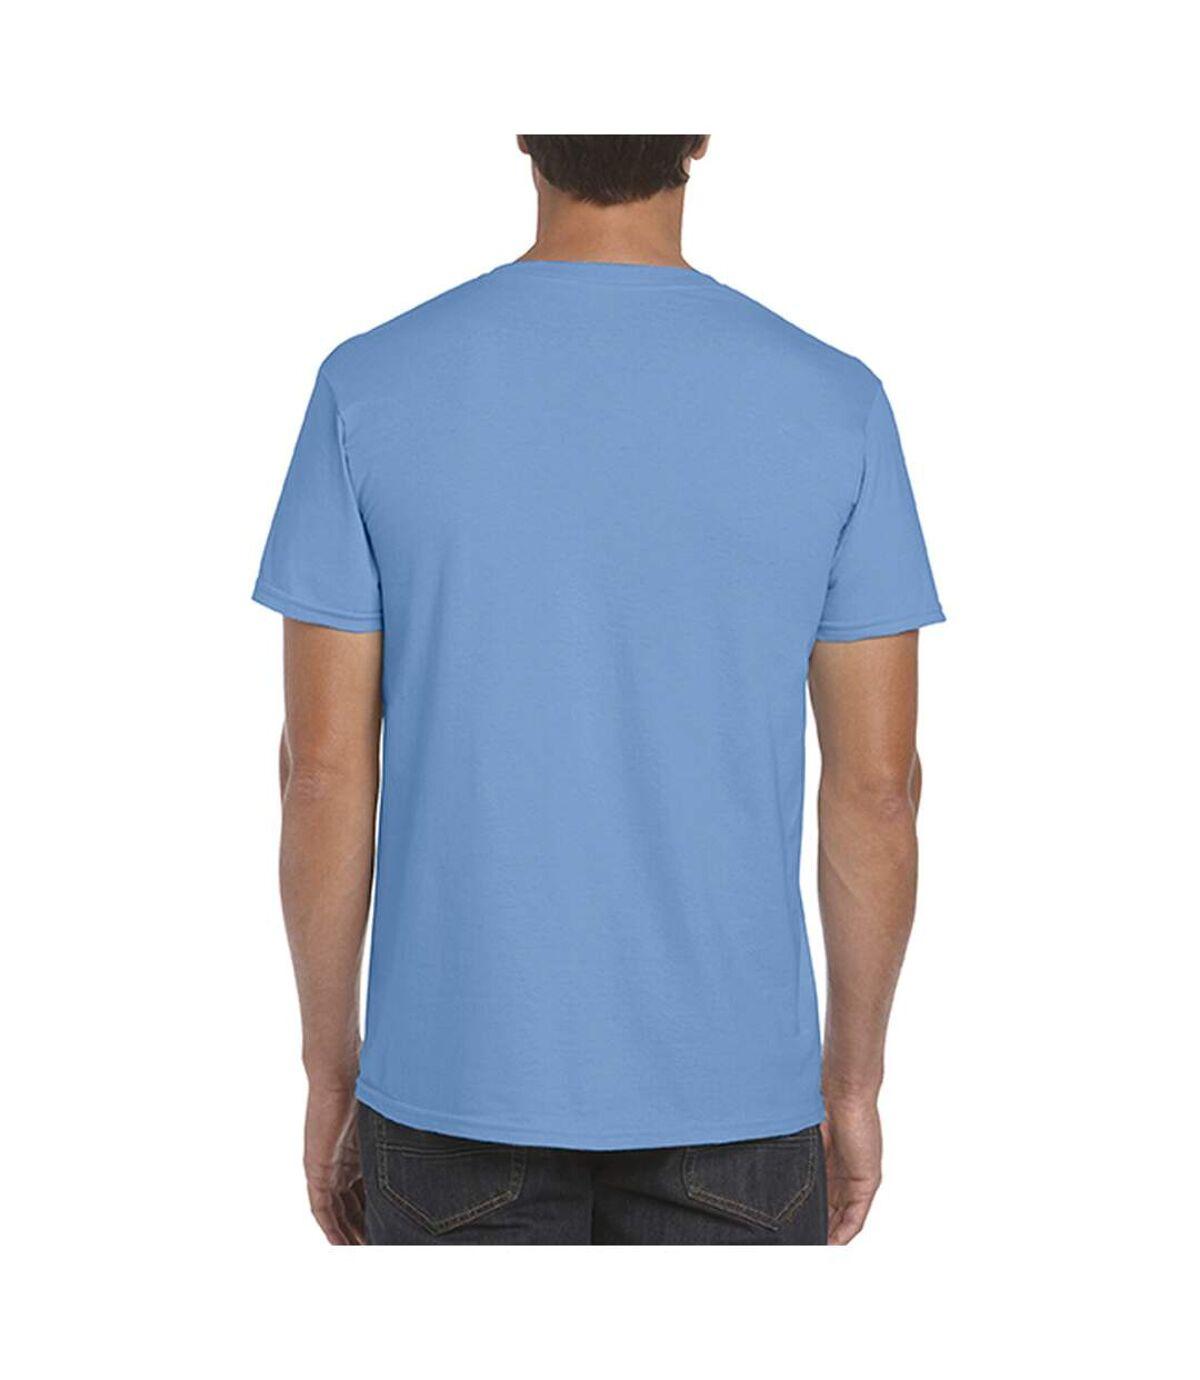 Gildan Mens Short Sleeve Soft-Style T-Shirt (Heather Purple) - UTBC484